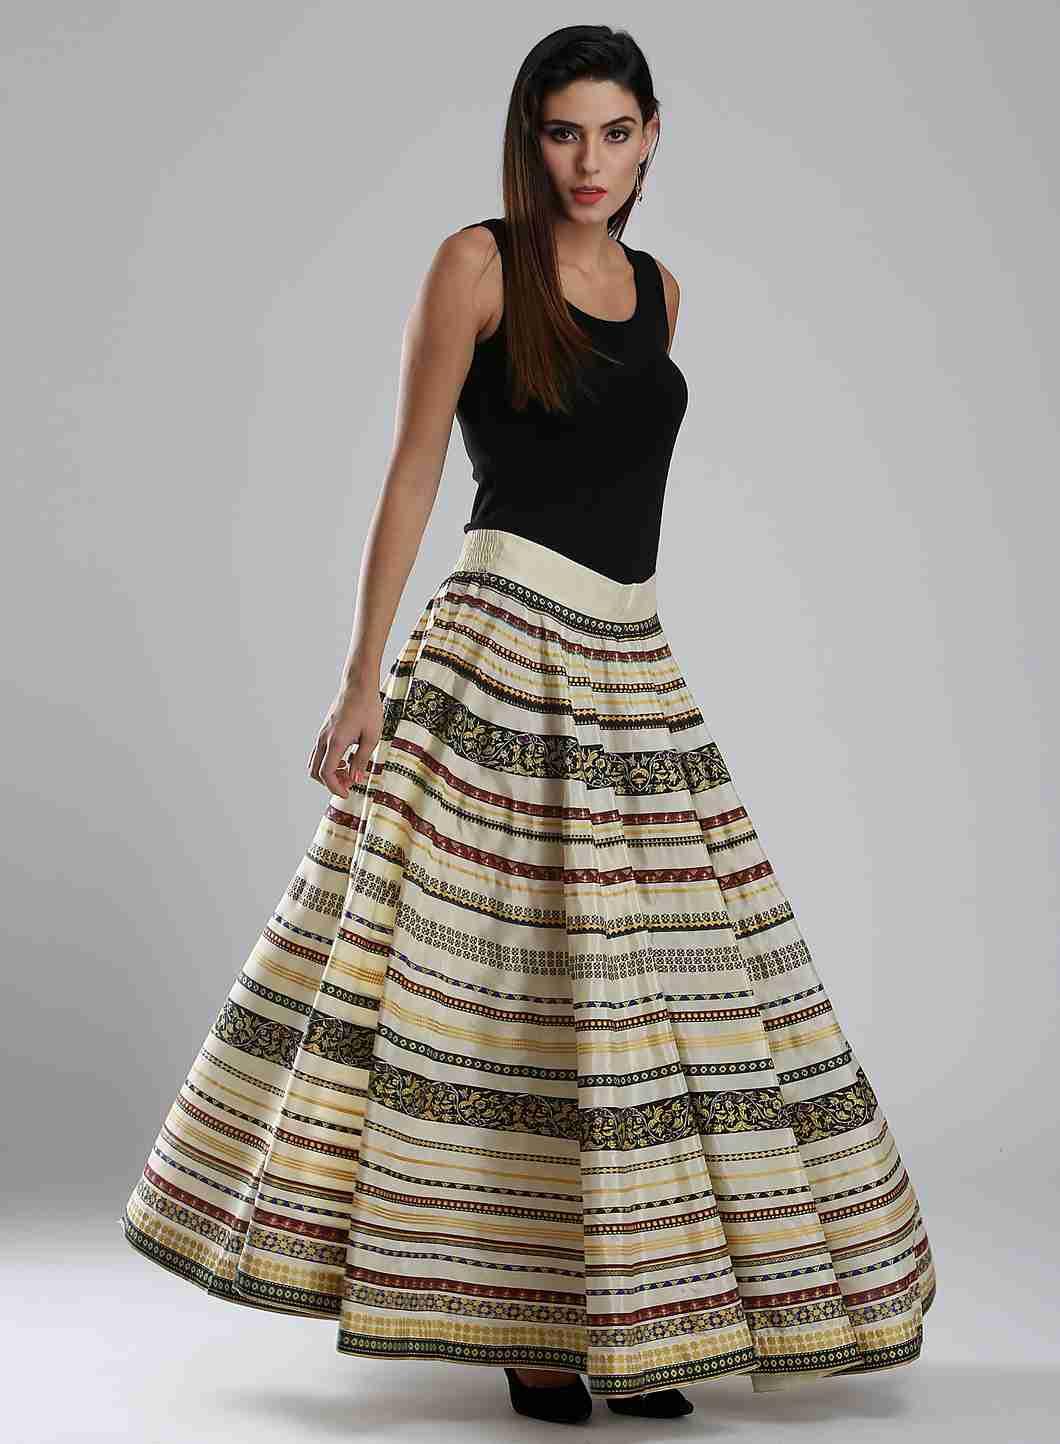 W | Wishful by W-Women White Color Skirt